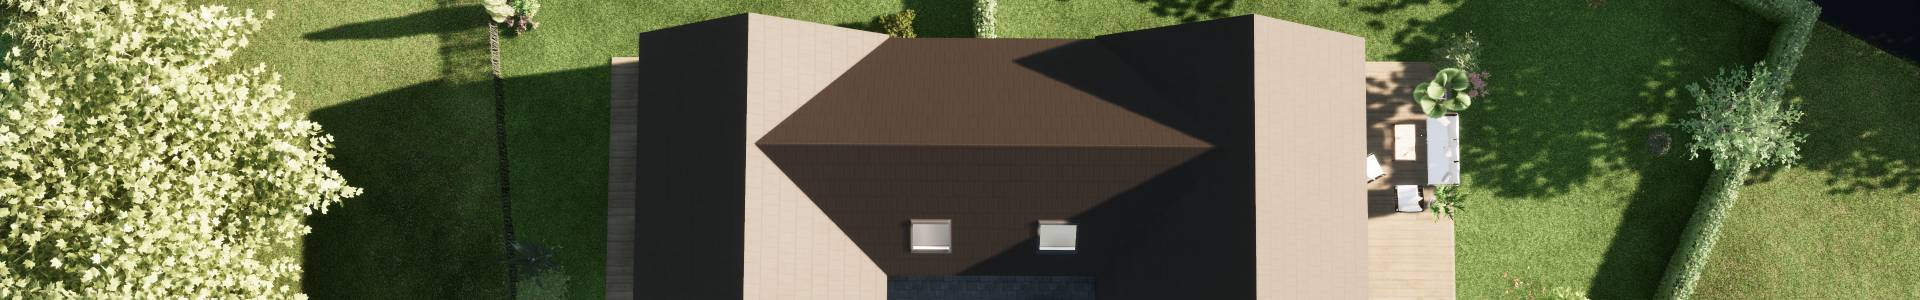 2 maisons neuves à Rountzenheim